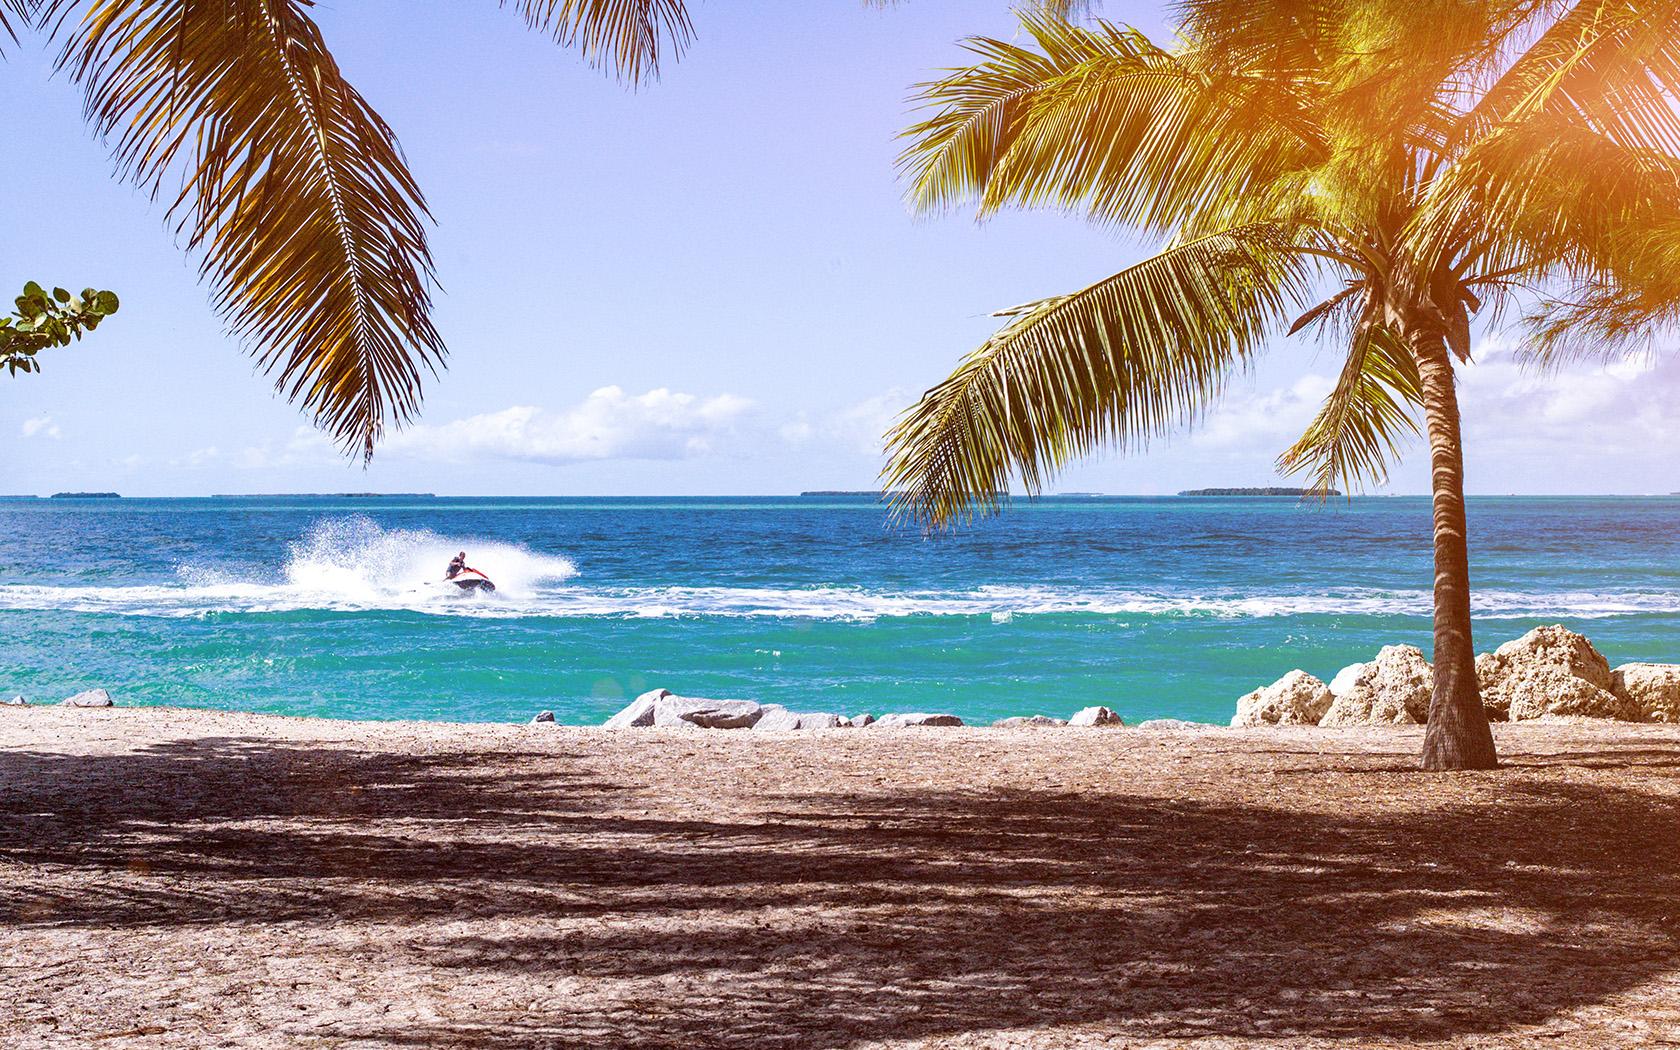 Iphone X Wallpaper Full Hd With Apple Logo No58 Summer Vacation Ocean Sea Nature Beach Wallpaper